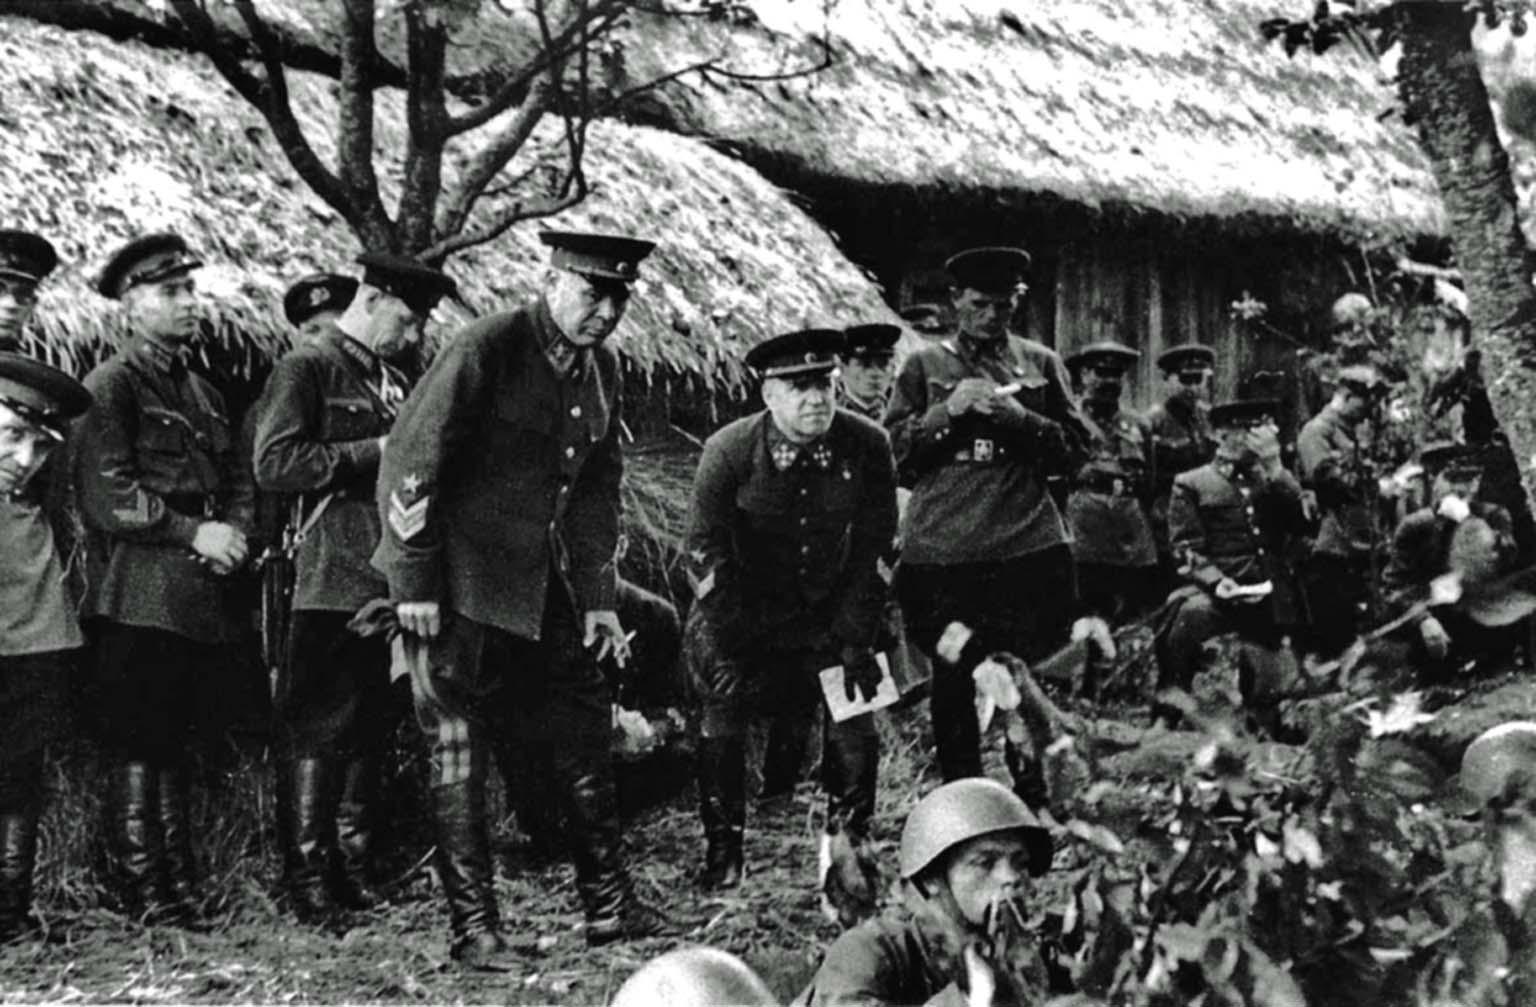 Semyon Timoshenko, Georgy Zhukovs